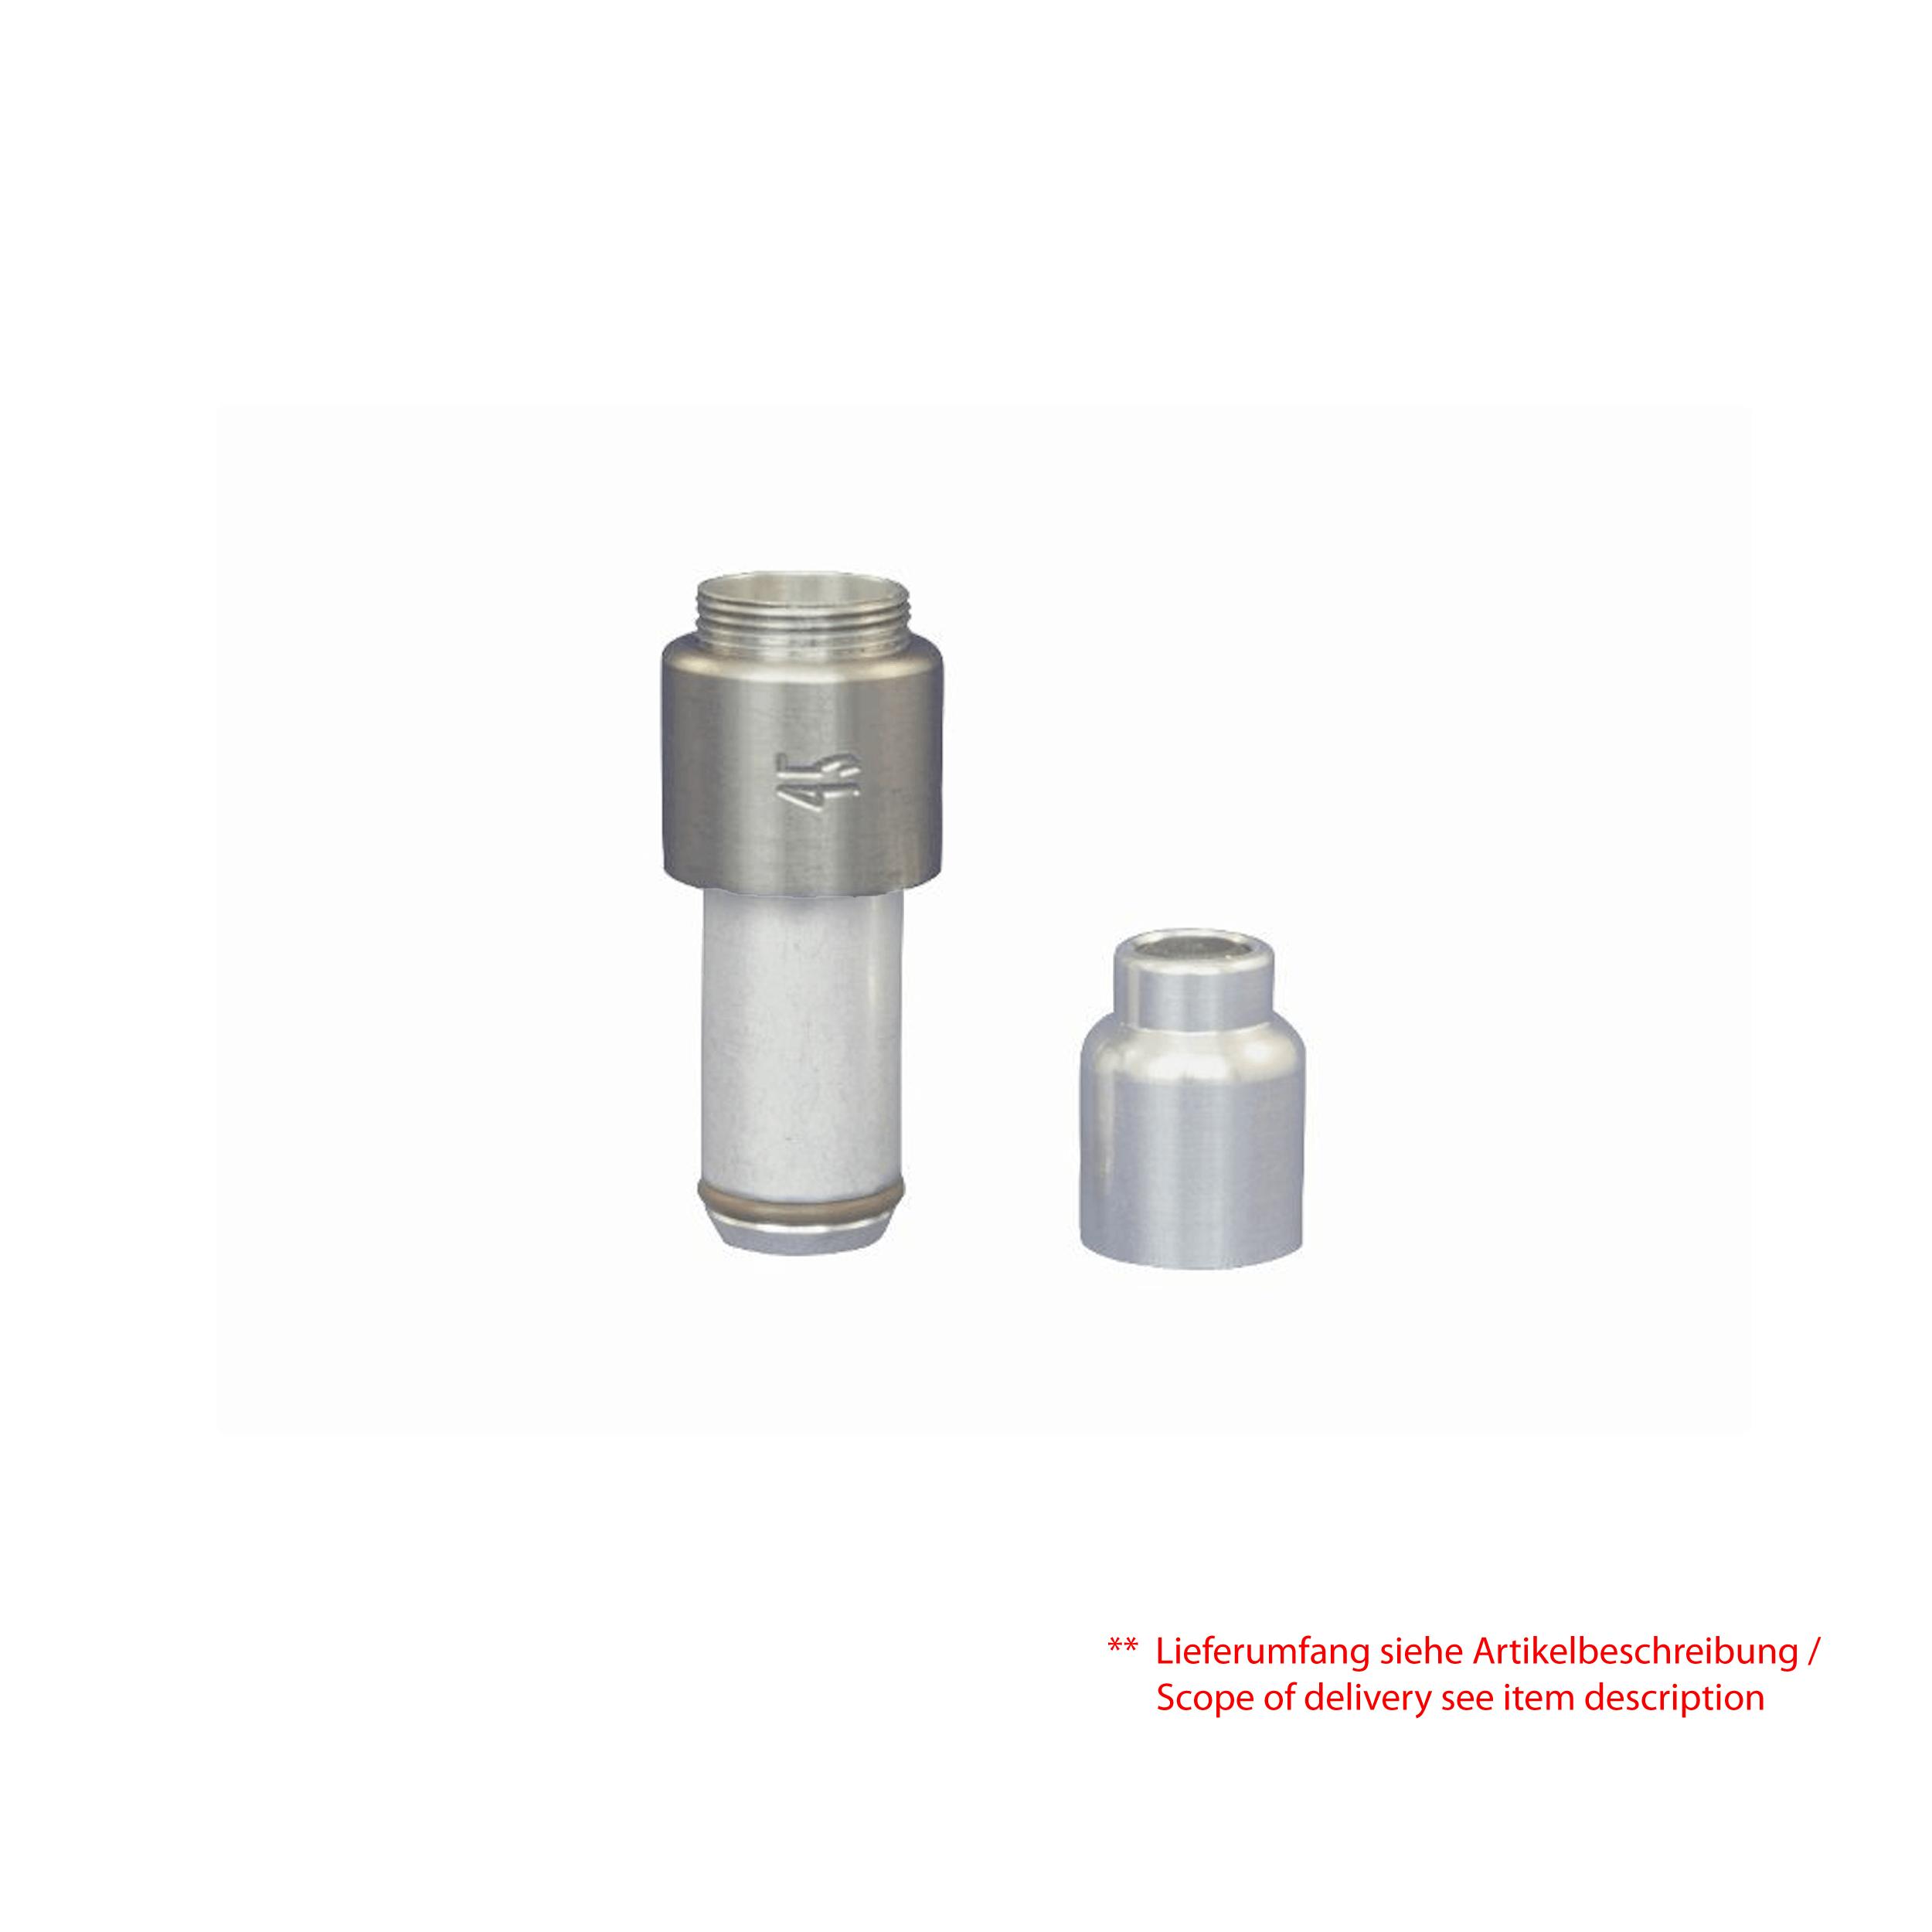 0.45 ACP Adapter Ring